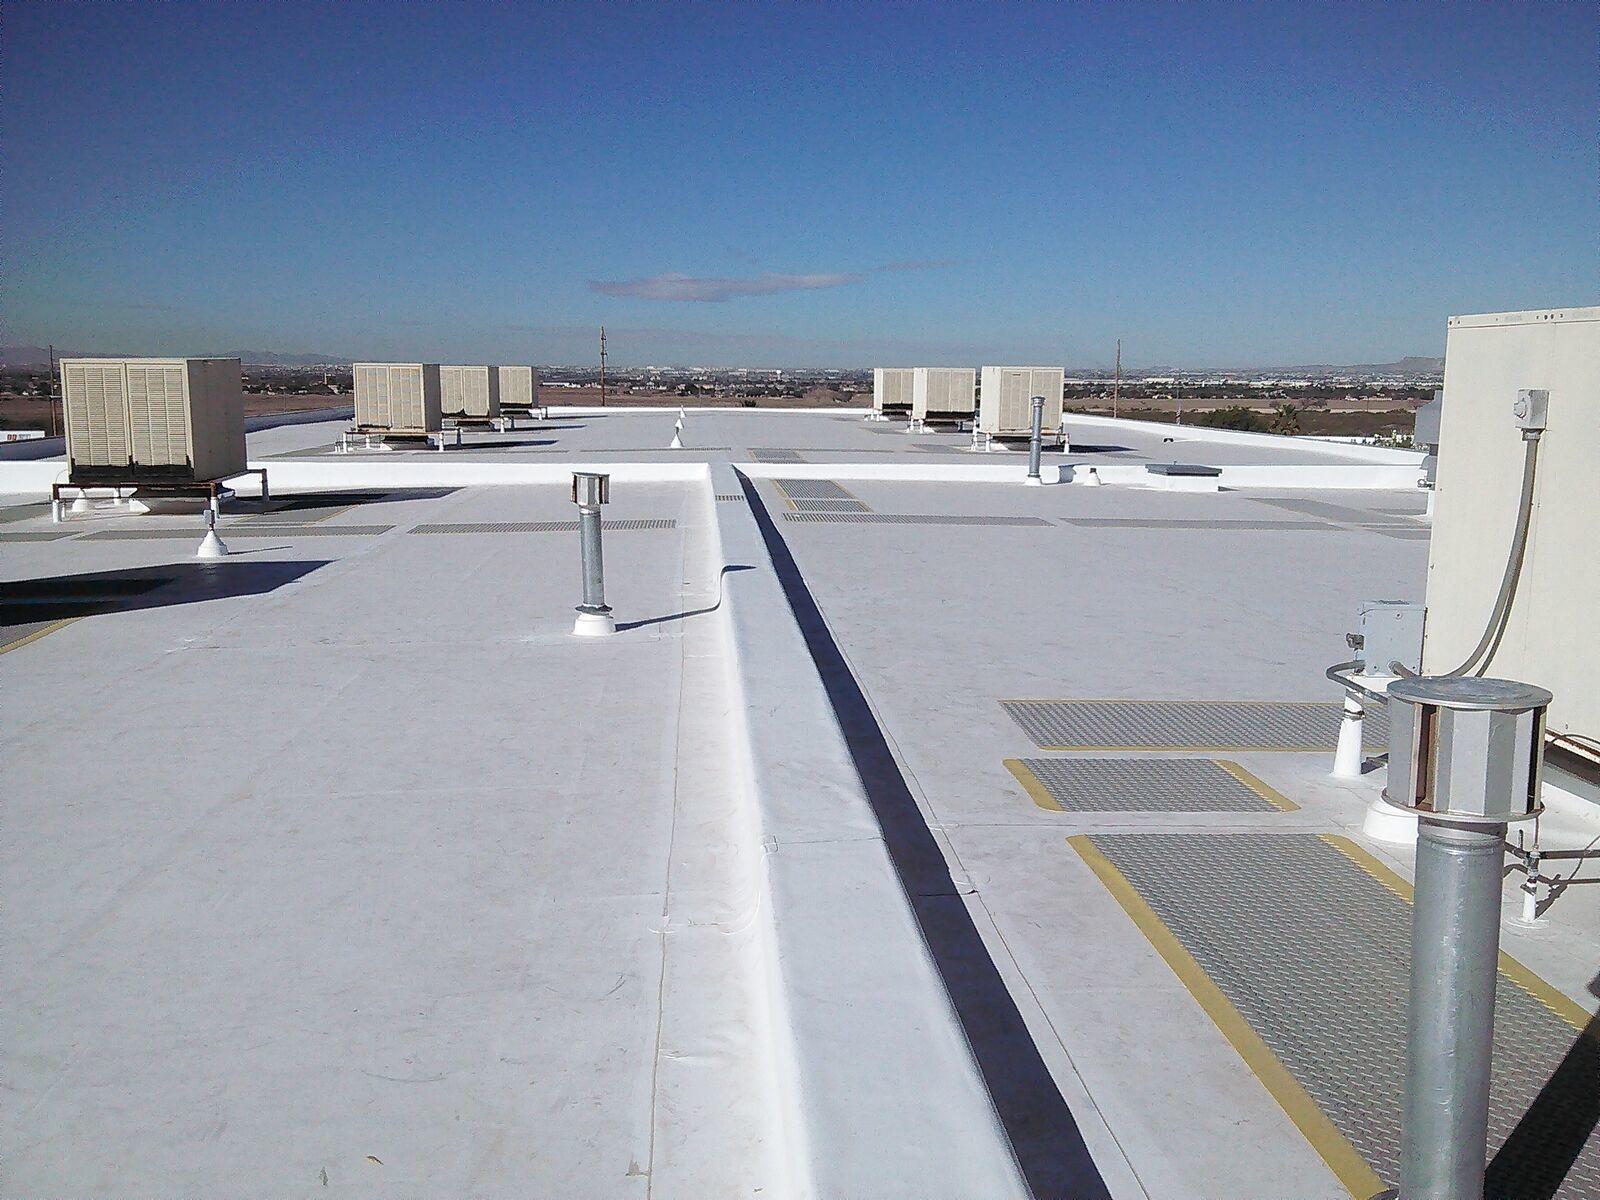 Professional Roofers & Contractors image 7